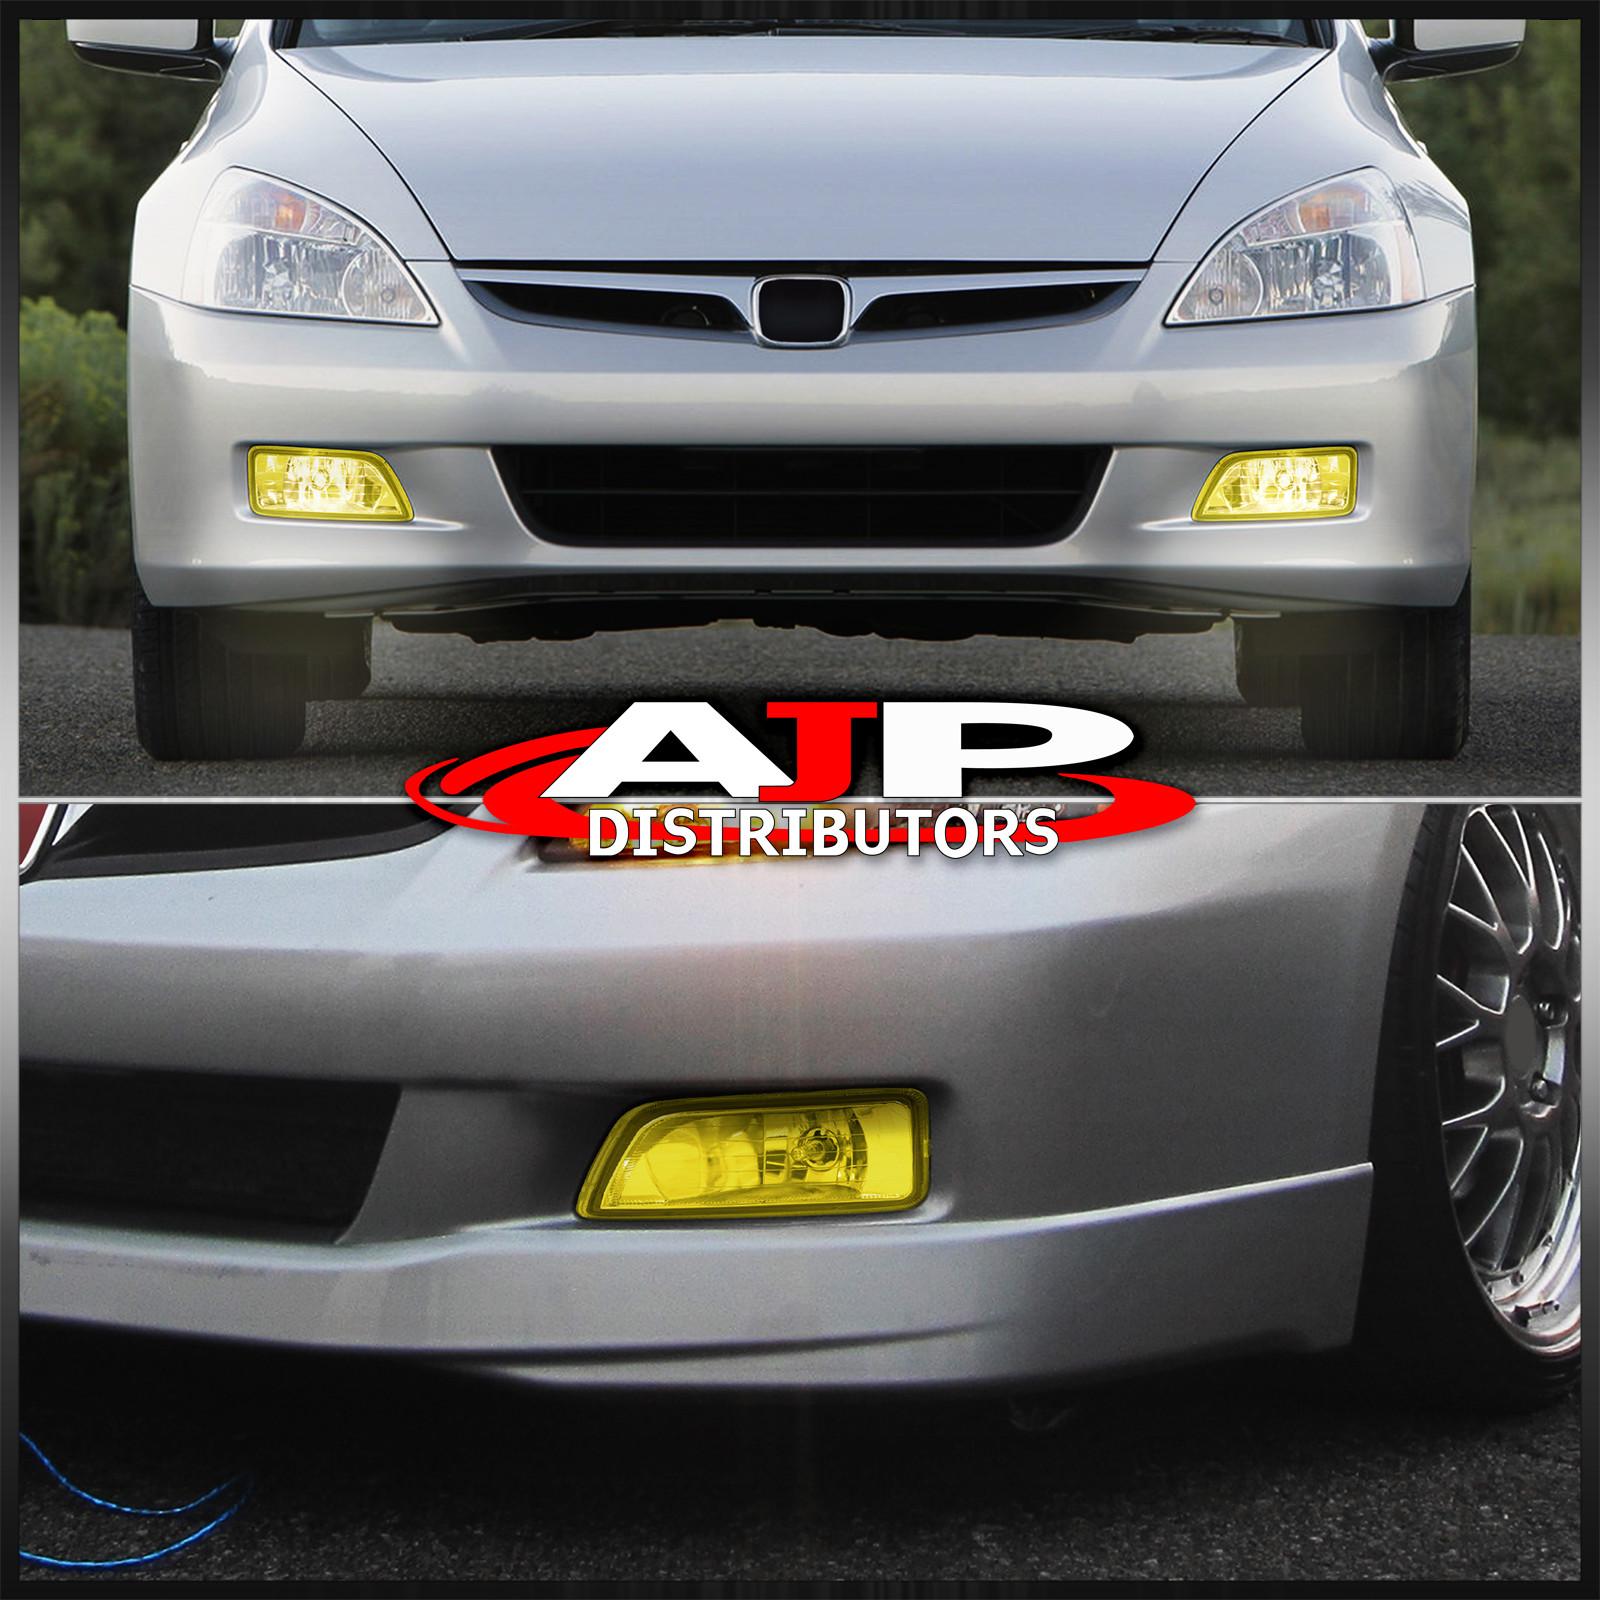 hight resolution of for 03 07 honda accord 4dr sedan 04 08 tl yellow fog lights switch harness